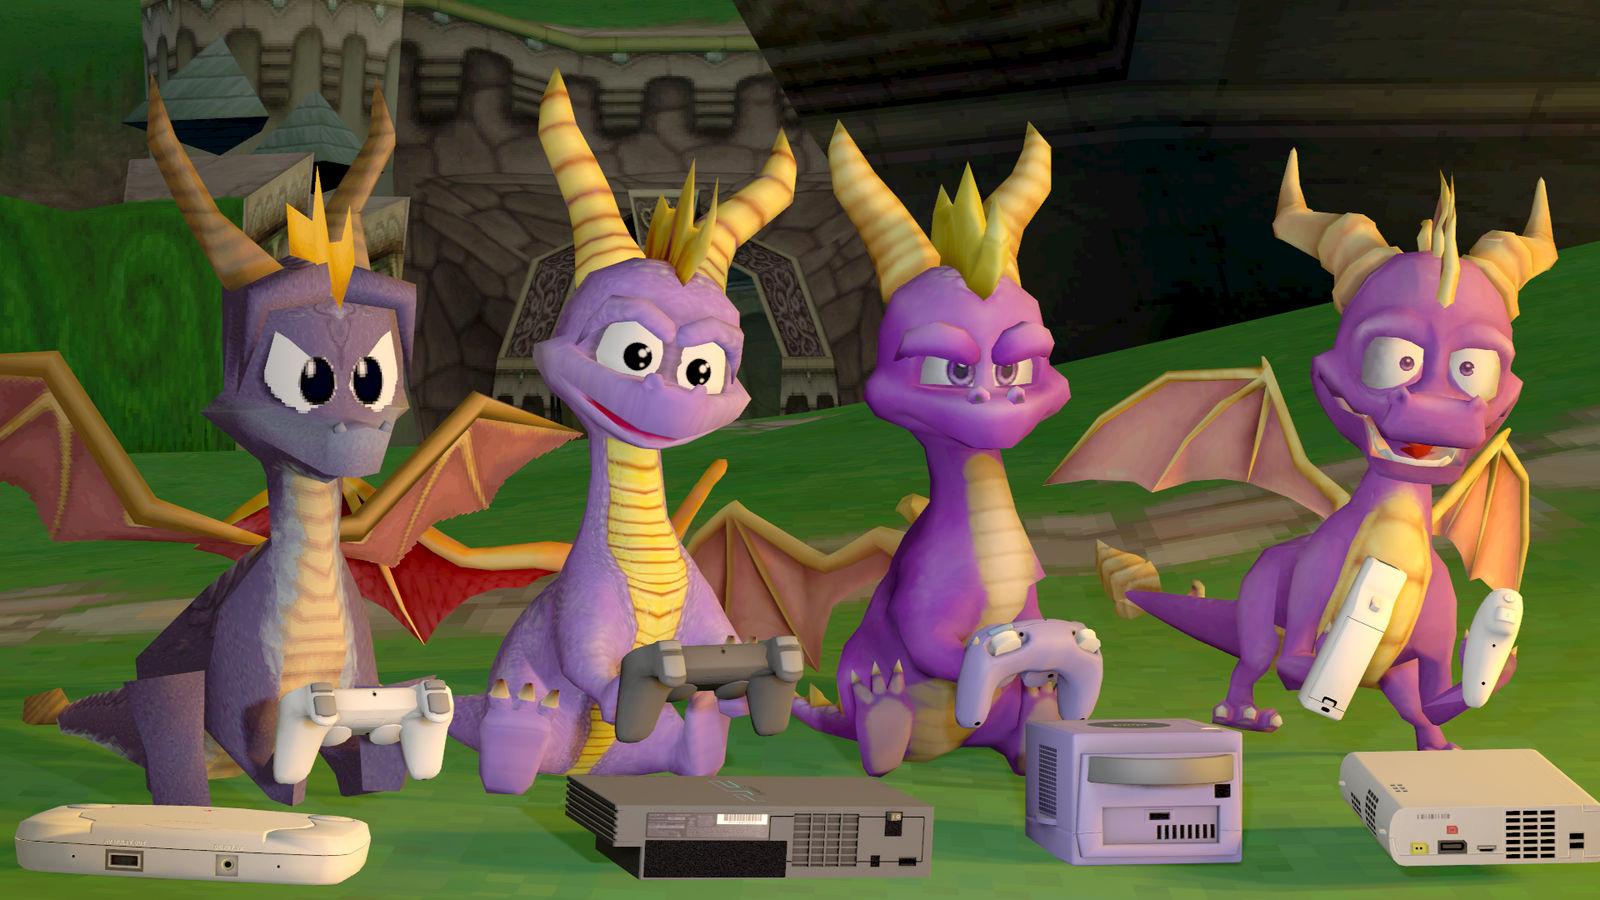 3D Sfm Videos sfm spyro) four dragons playing video gamesthunder